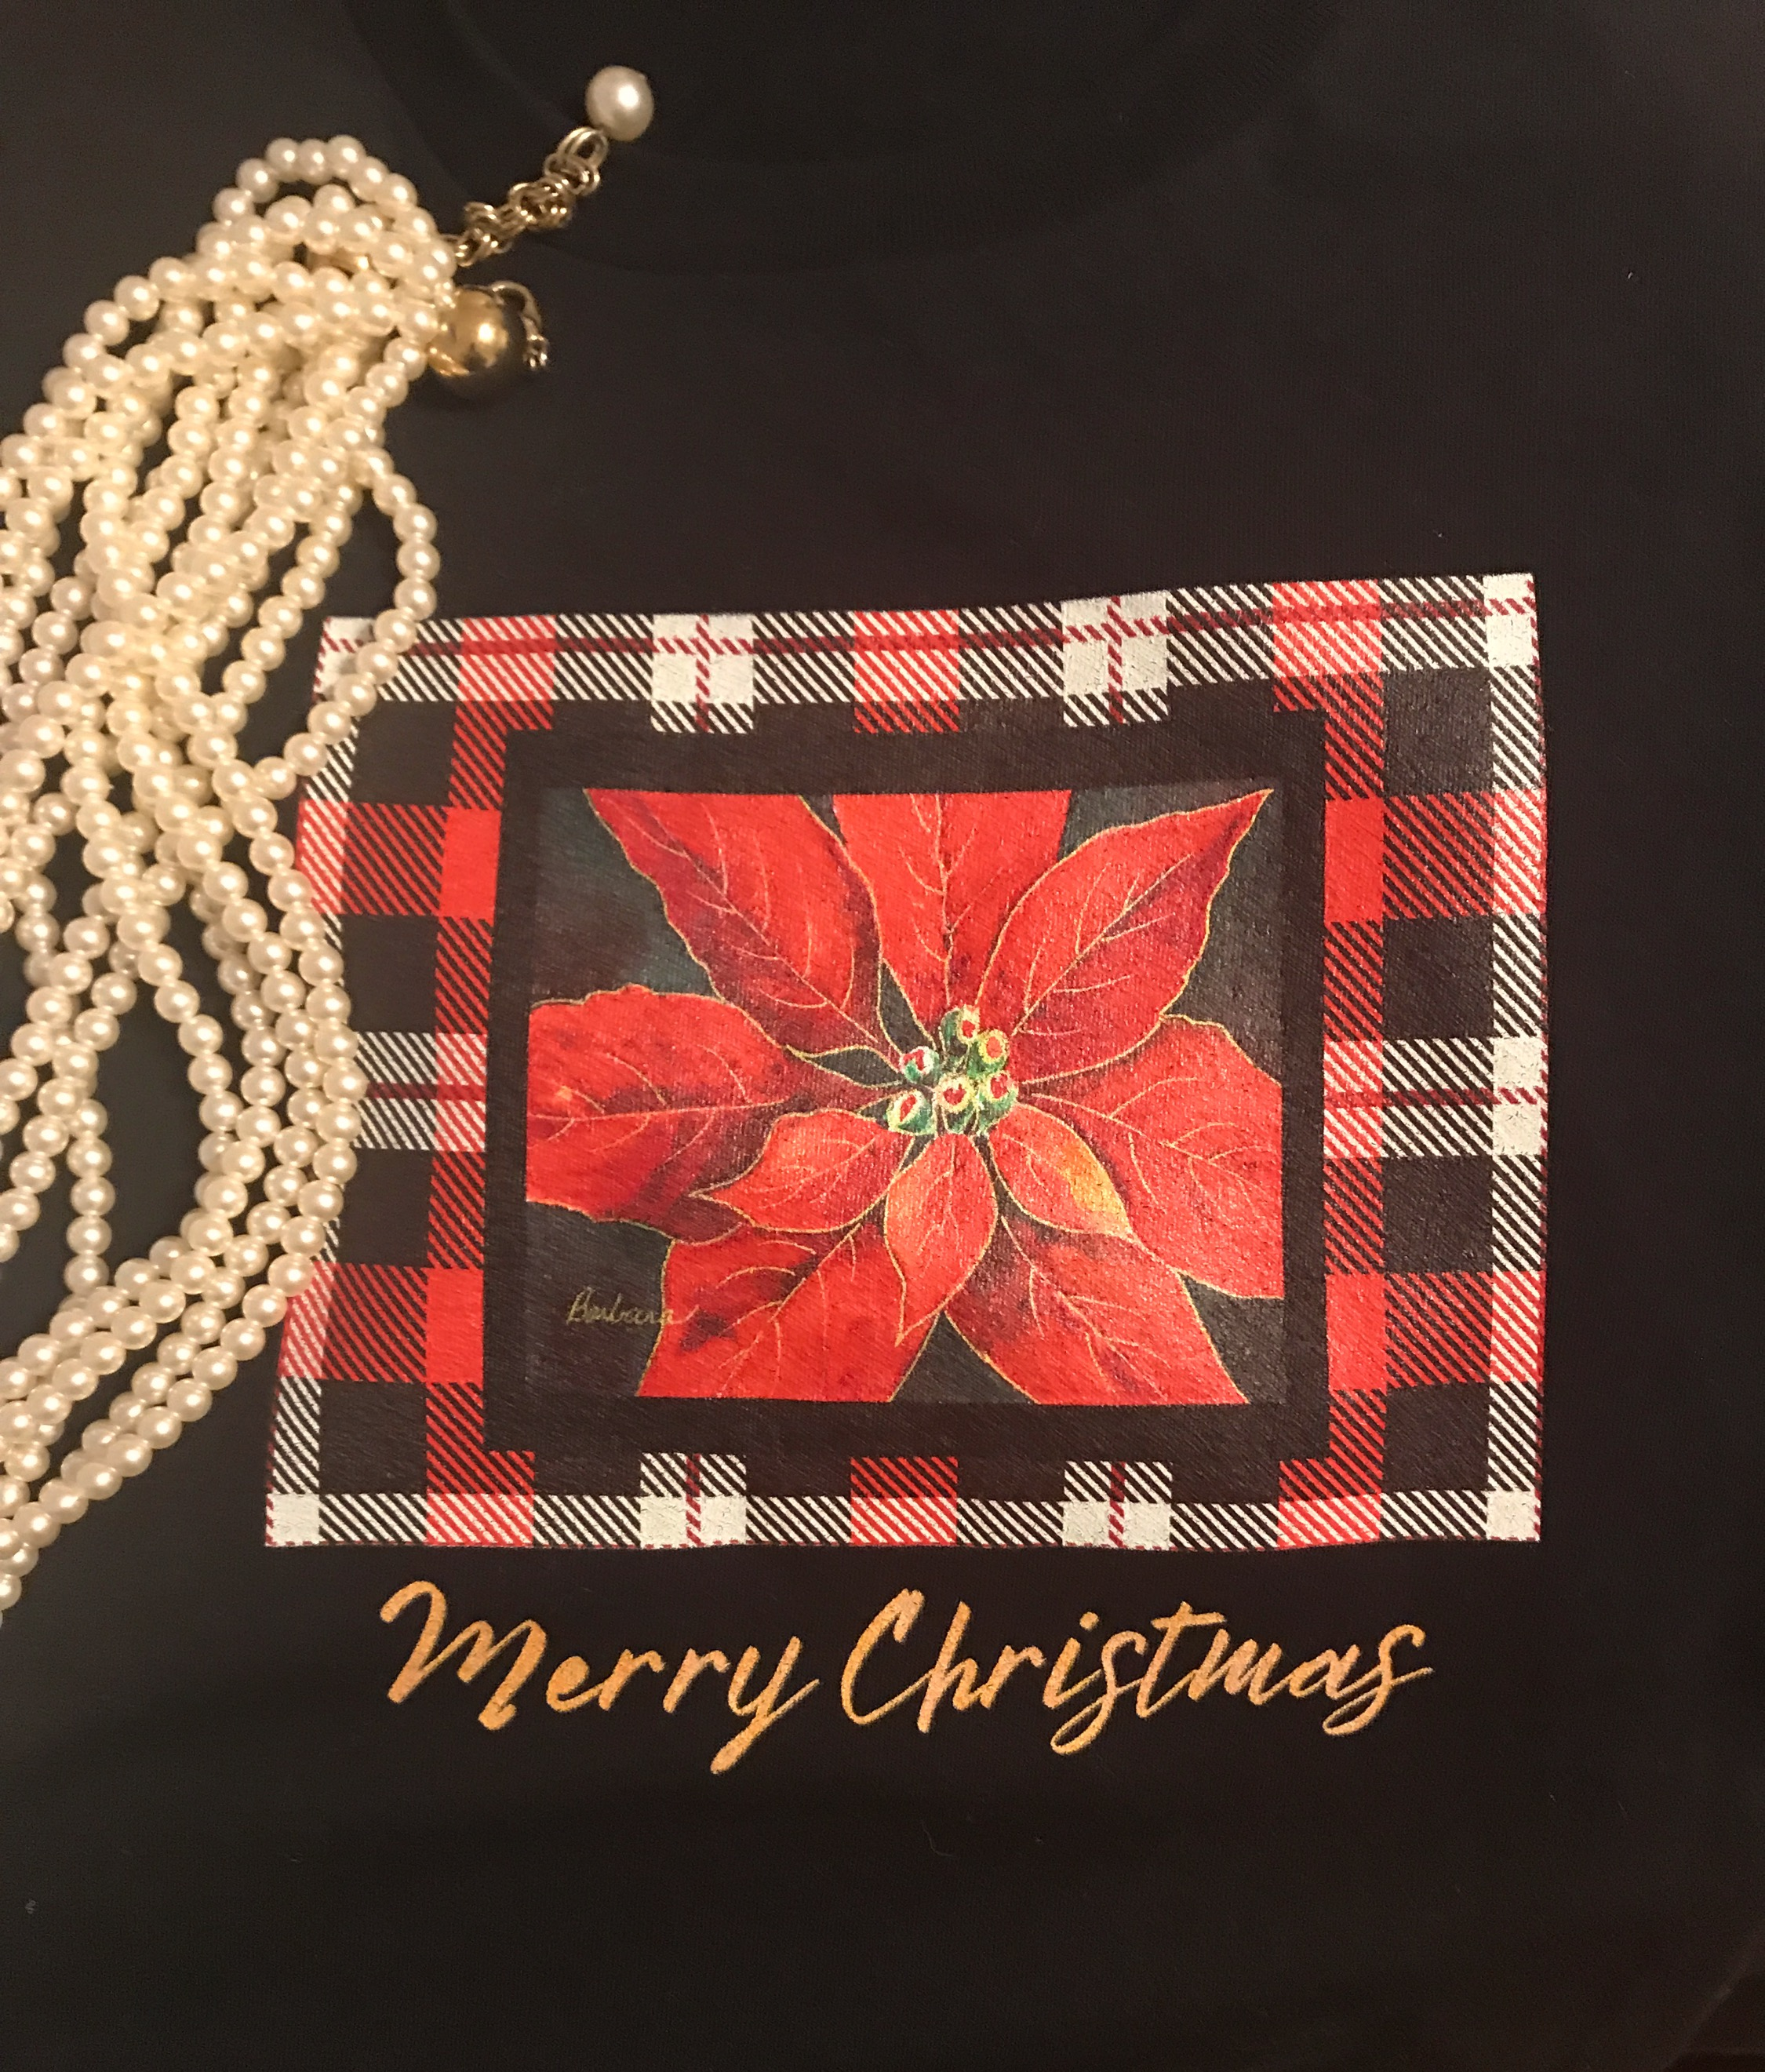 Christmas plaid poinsettia shirt cropped